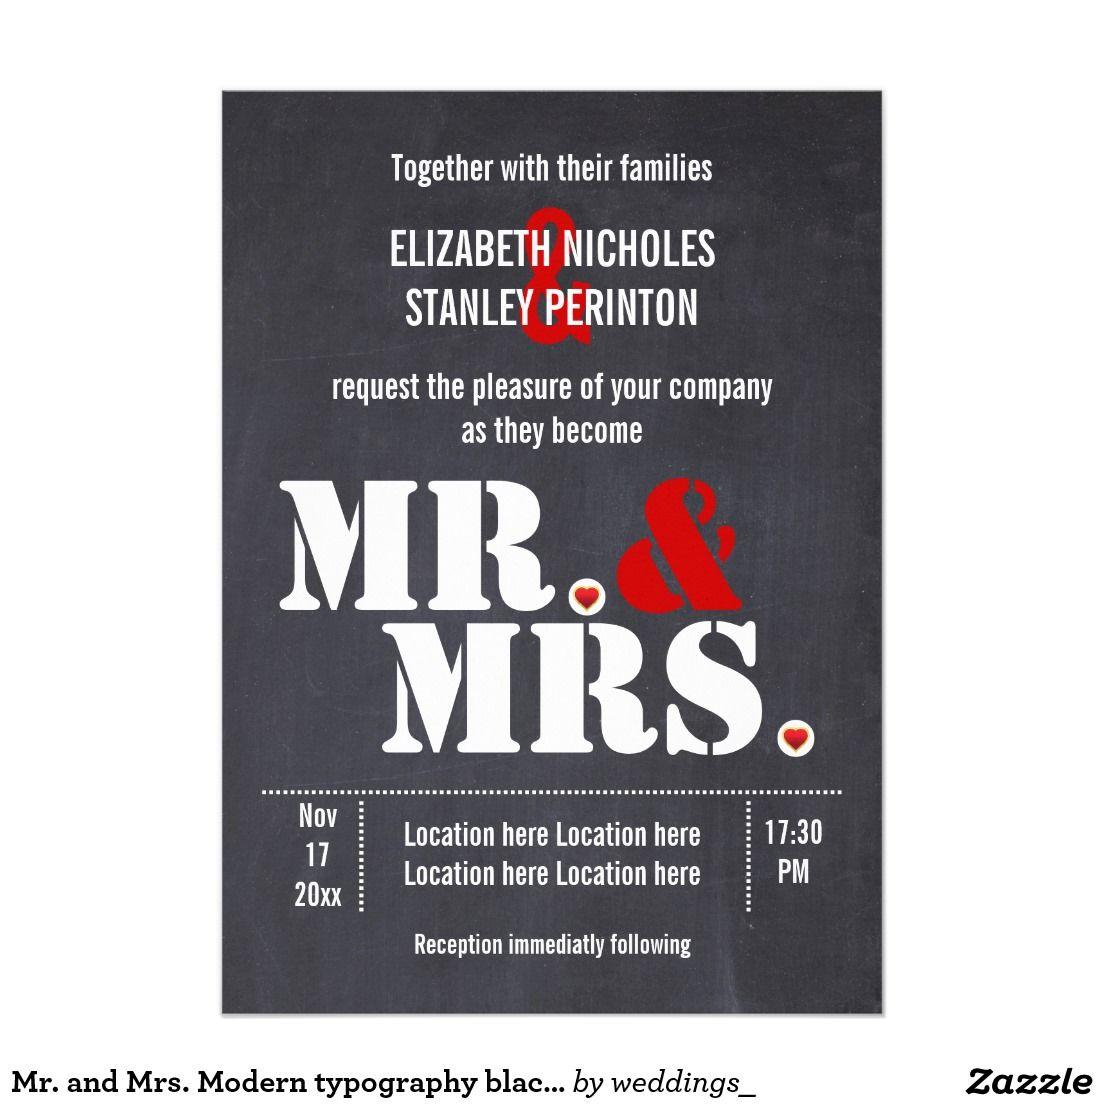 Mr. and Mrs. Modern typography black red wedding